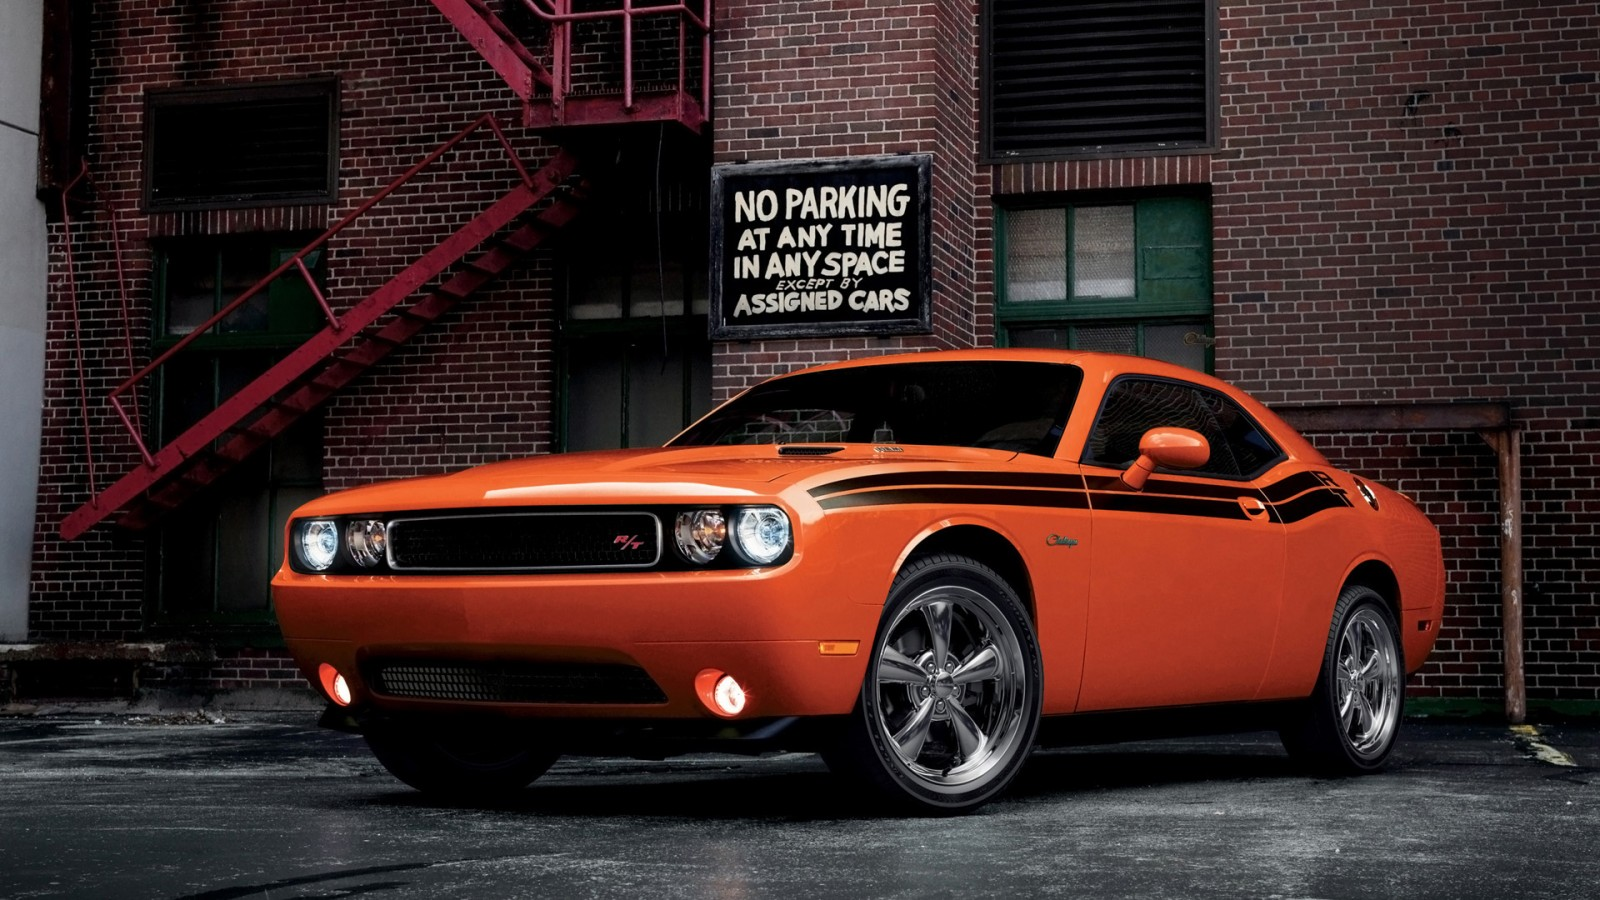 2019 Dodge Challenger >> 2014 Dodge Challenger RT Classic Wallpaper   HD Car ...